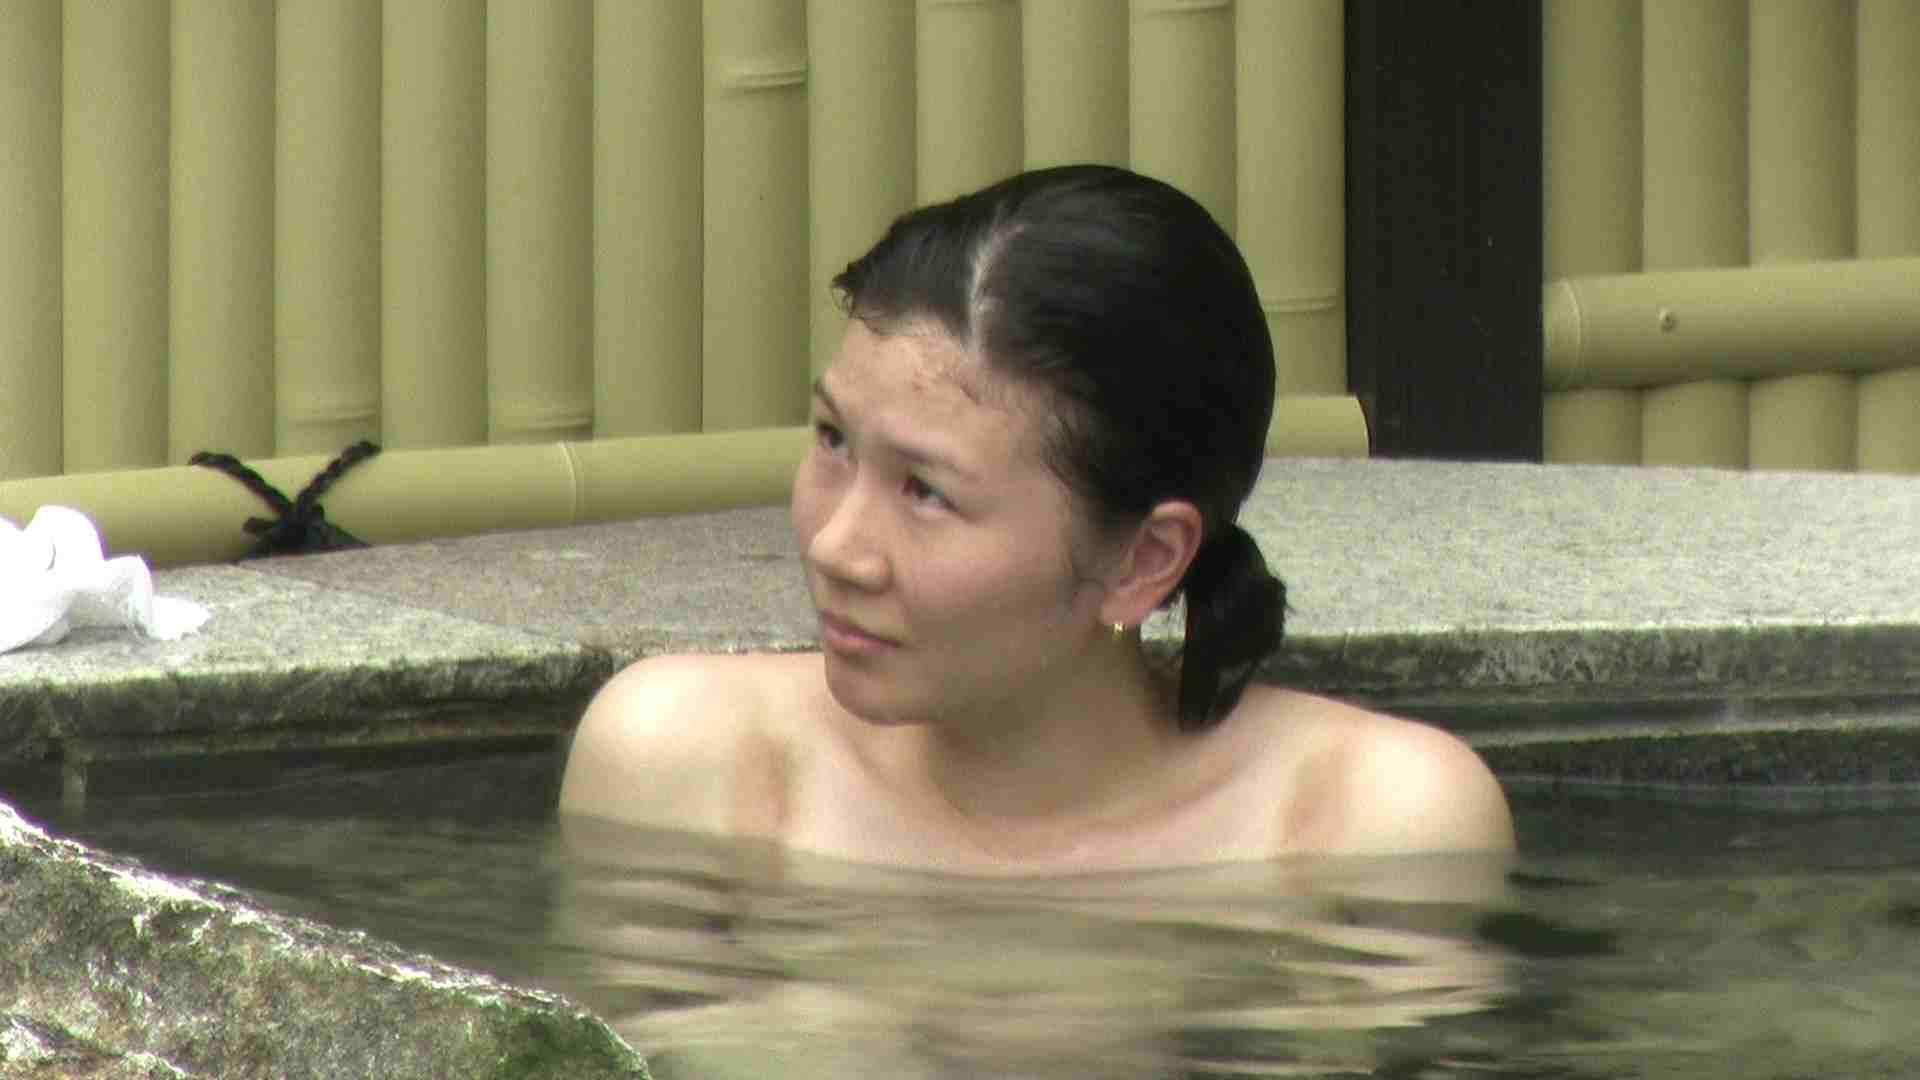 Aquaな露天風呂Vol.187 盗撮   HなOL  96pic 36